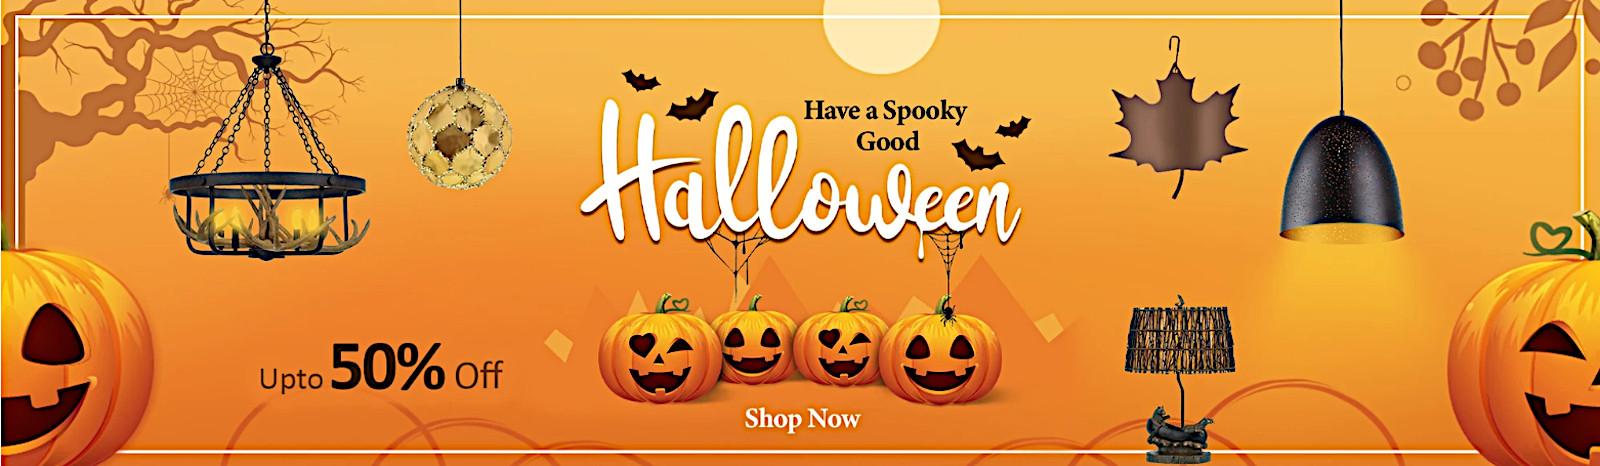 Cut-price Celebrate Halloween